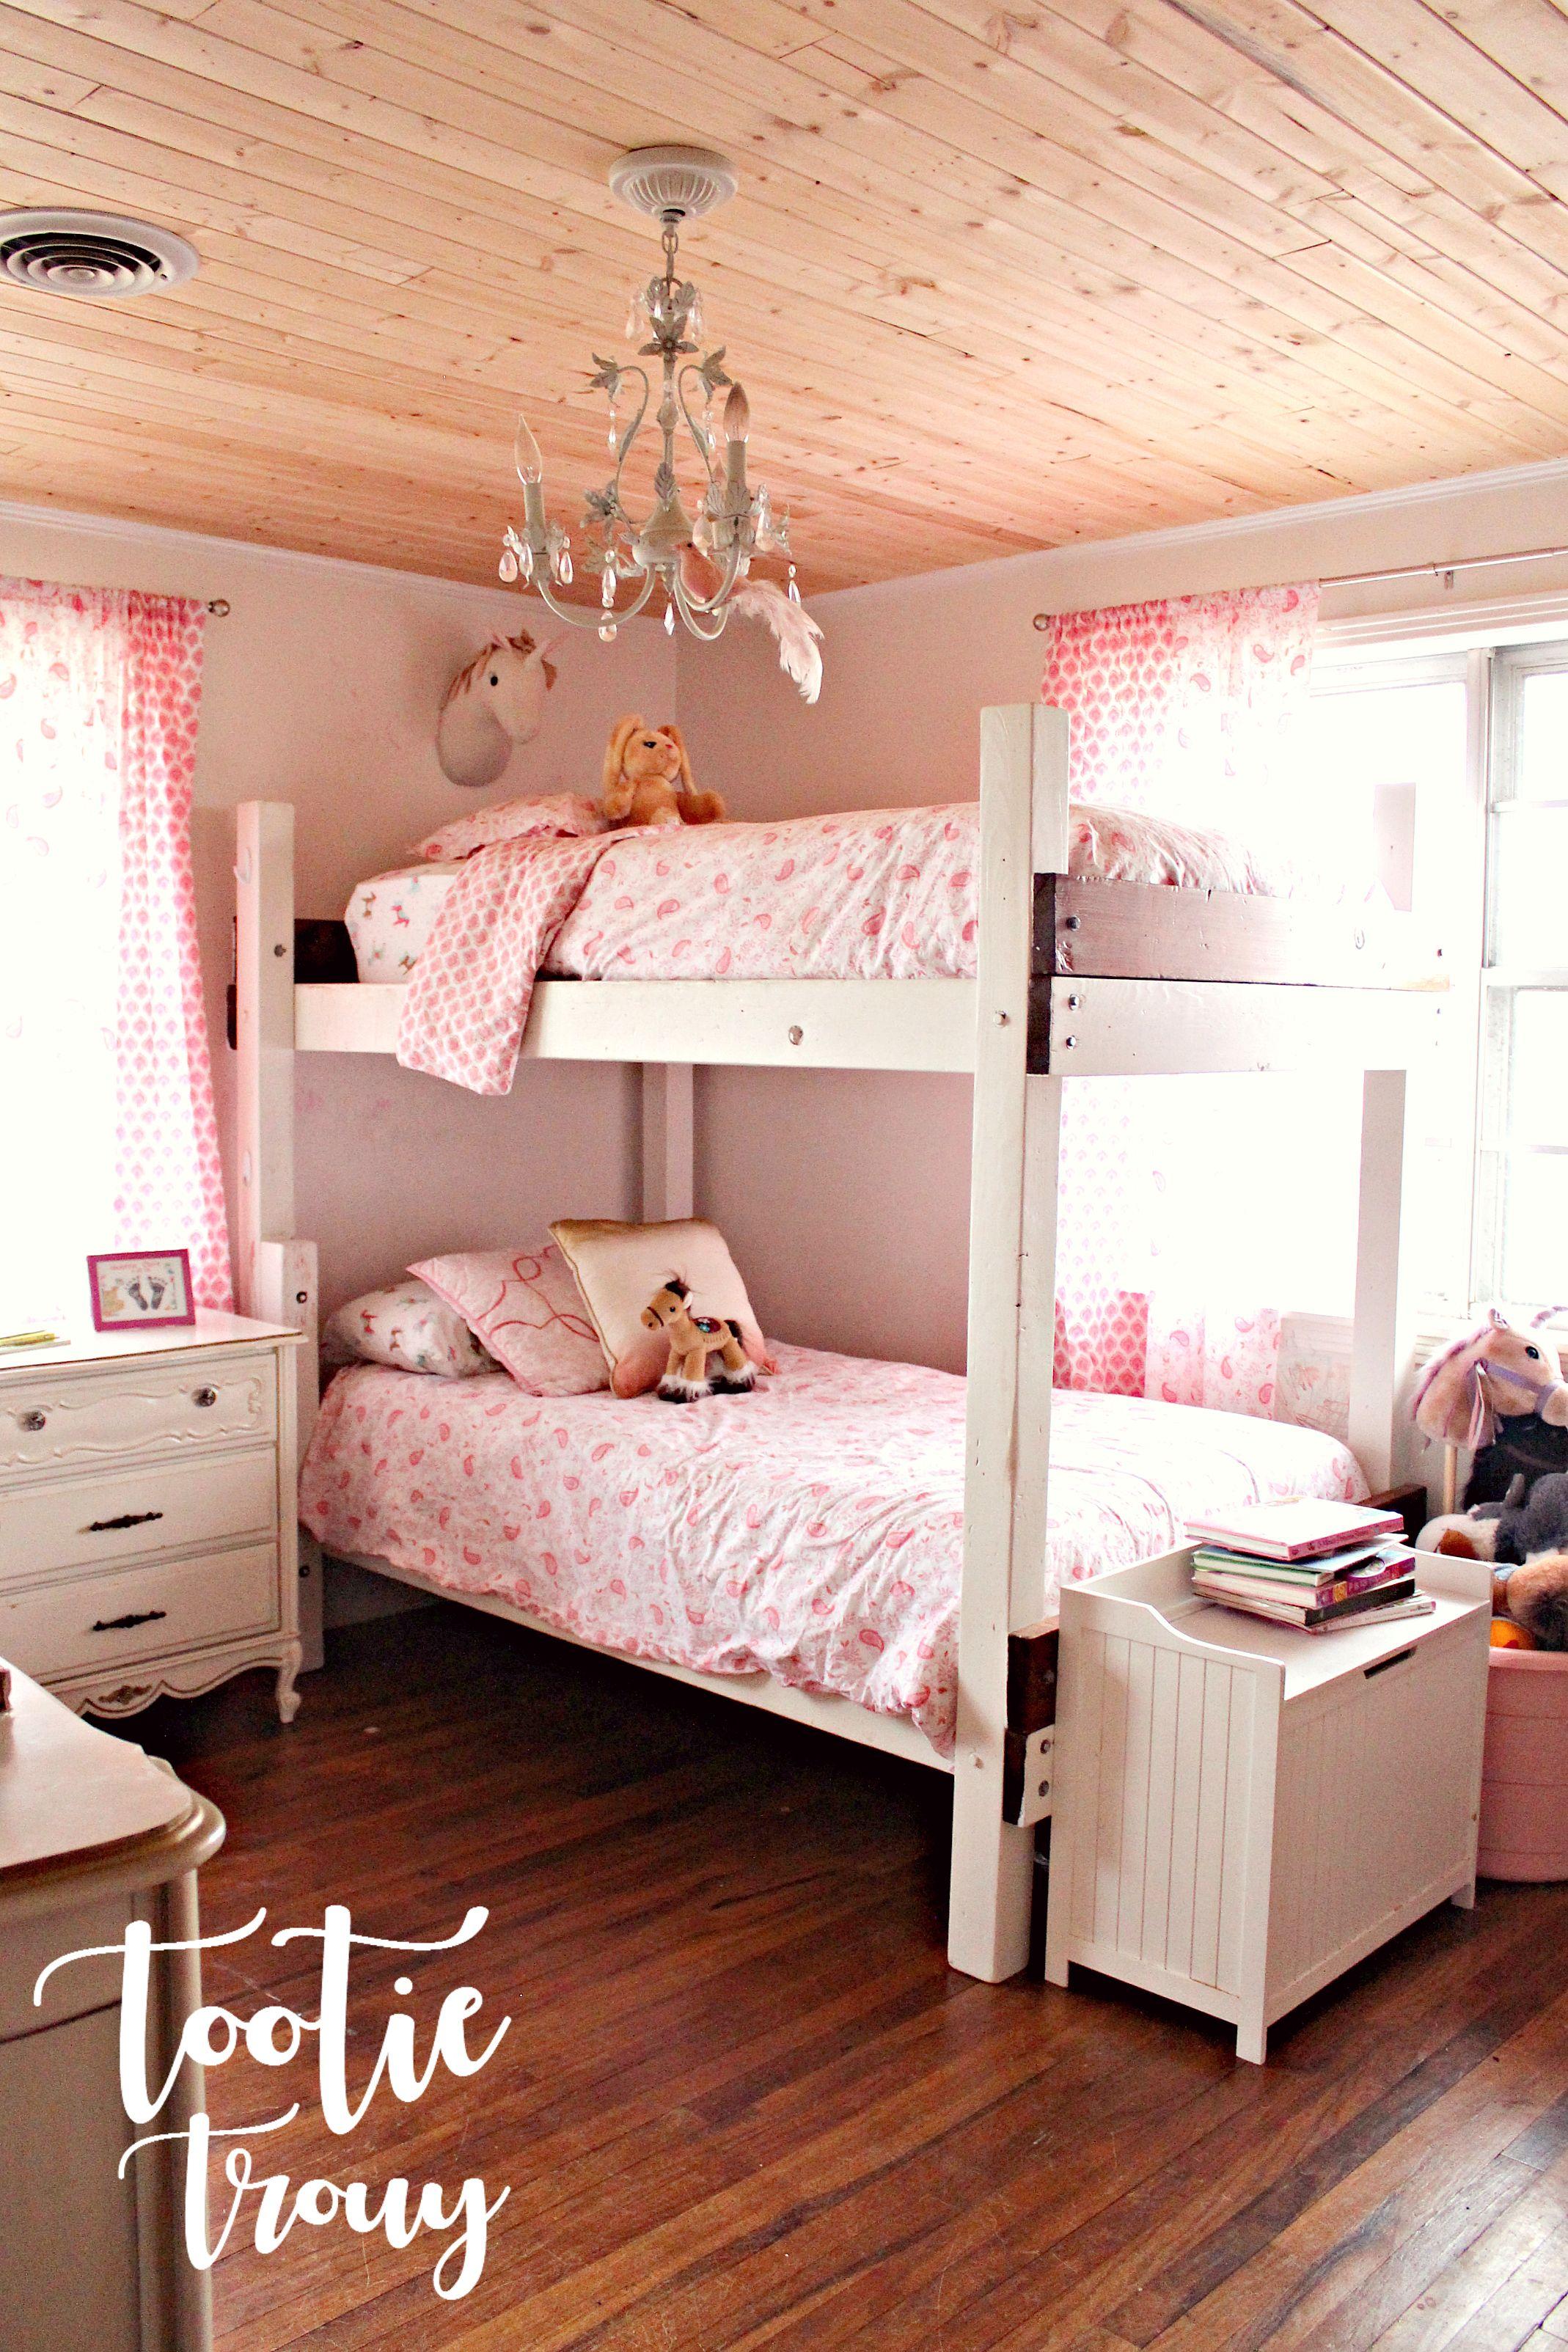 Tootie trouy home interior design real estate bunk bed girls tootie trouy home interior design real estate bunk bed girls room pink chandelier interior arubaitofo Image collections